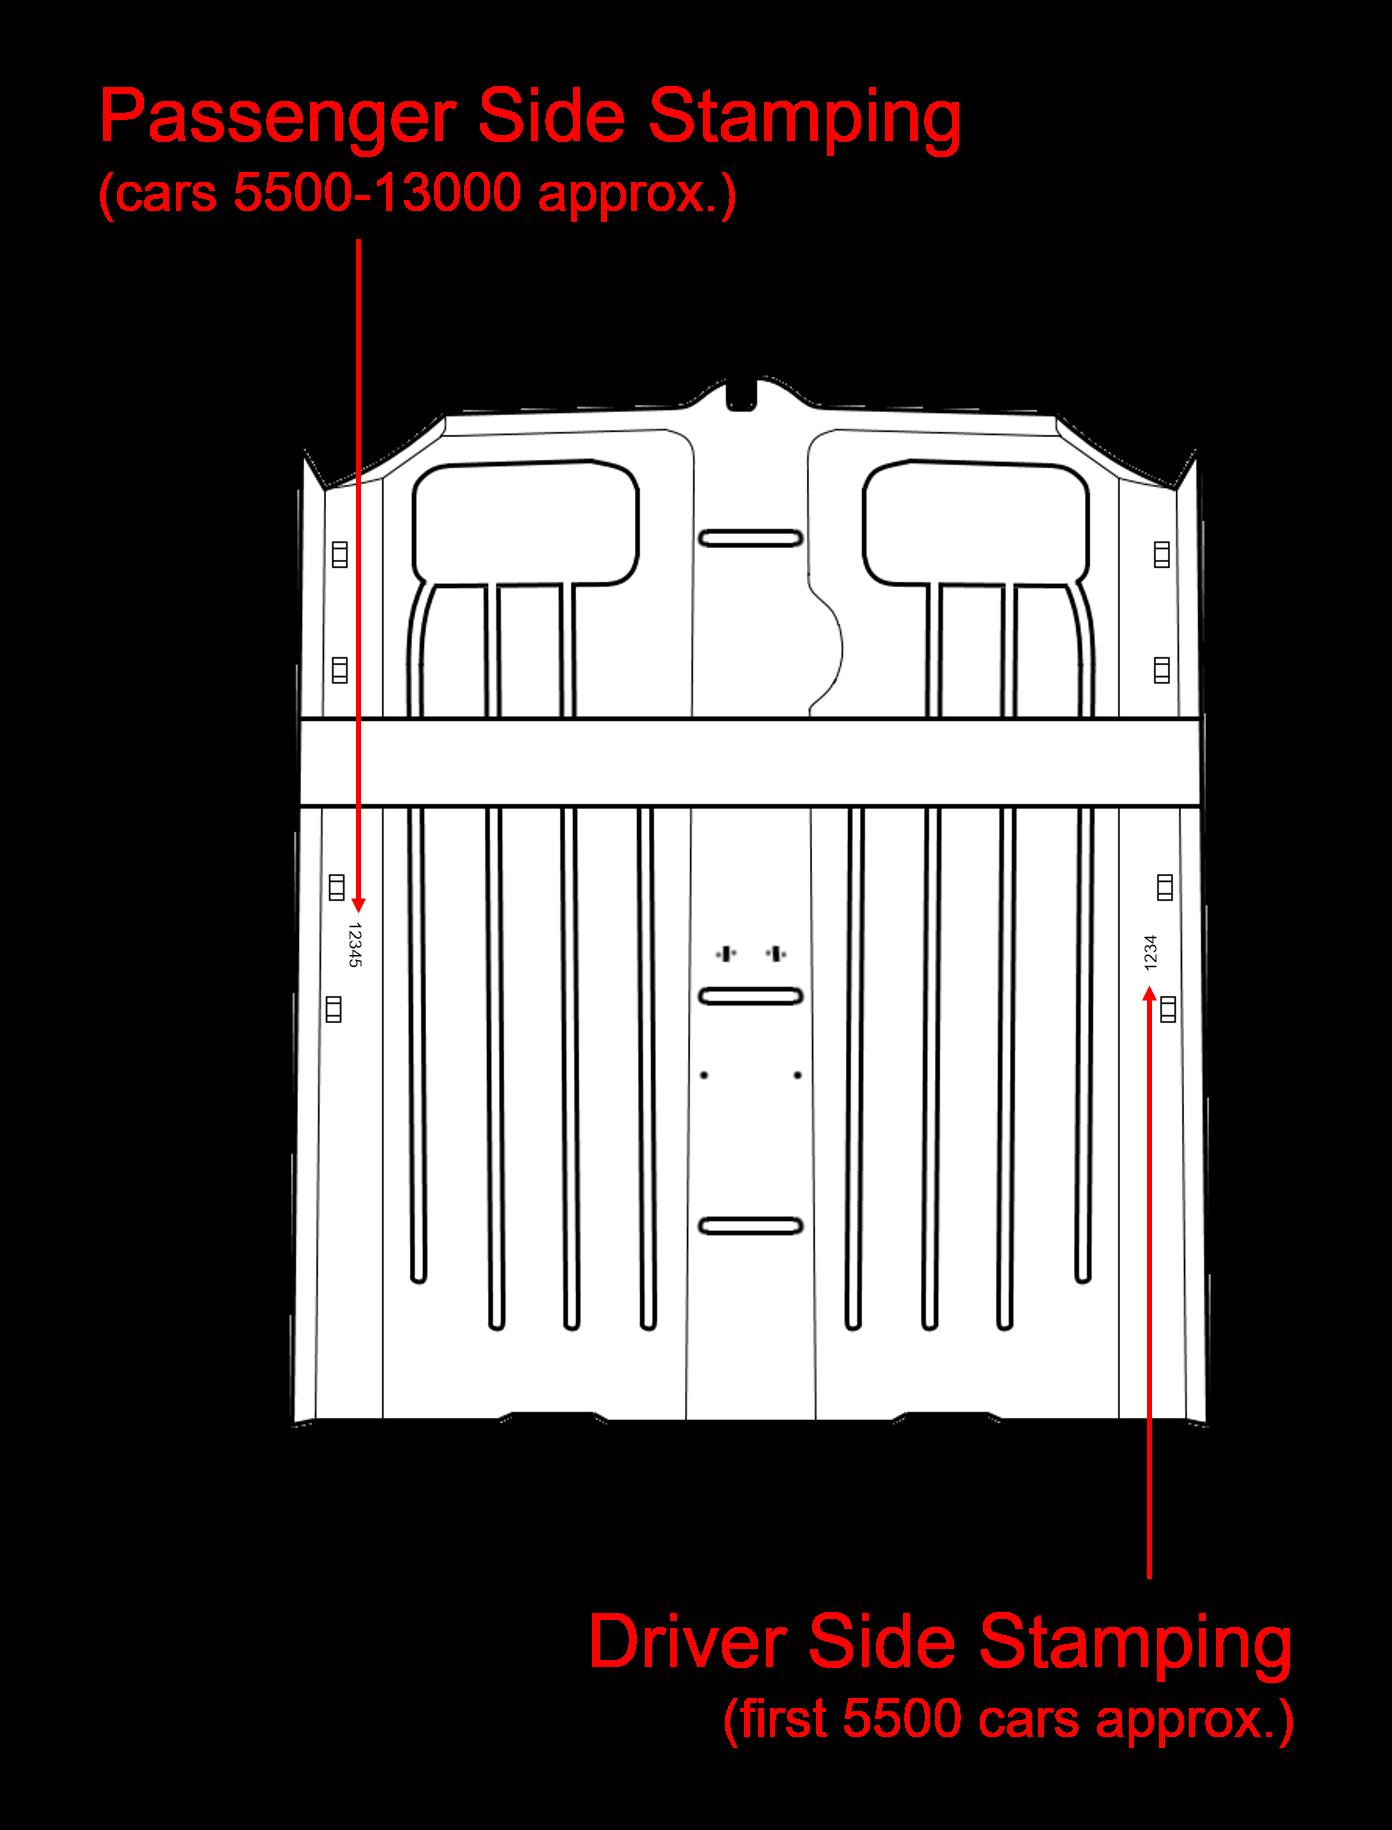 Car Number - Floor